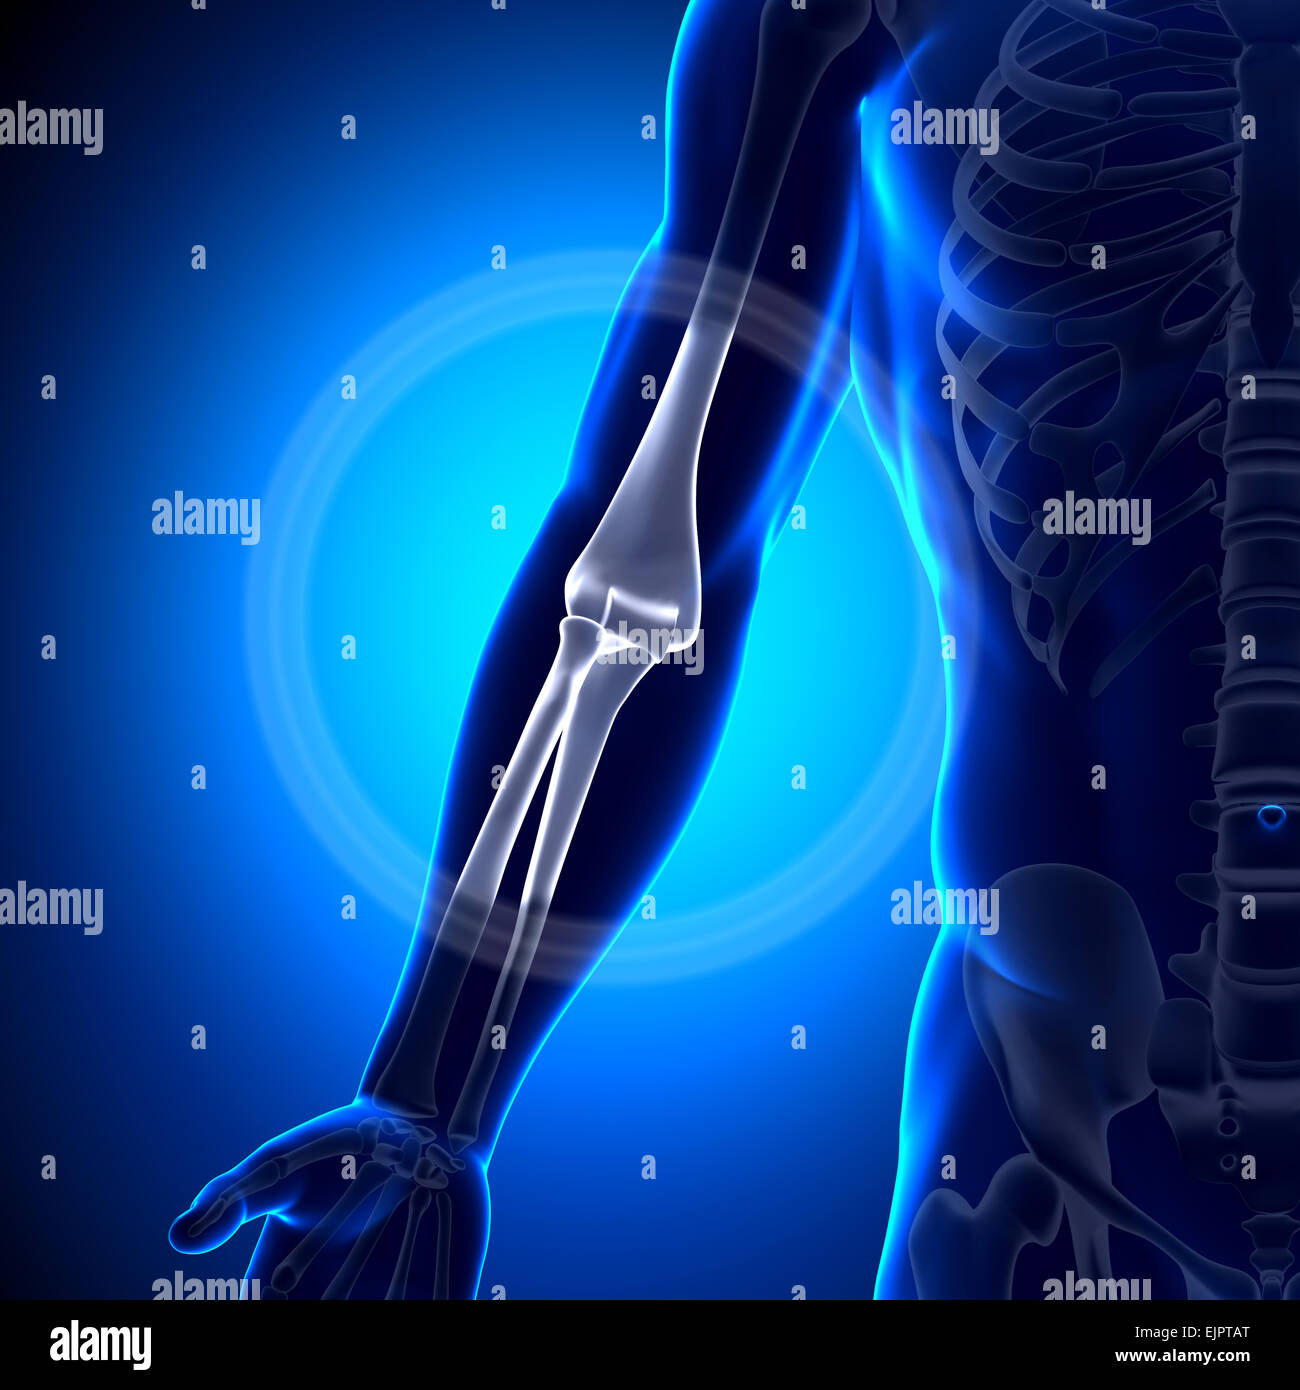 Male Elbow Anatomy Bones Stock Photo 80407344 Alamy